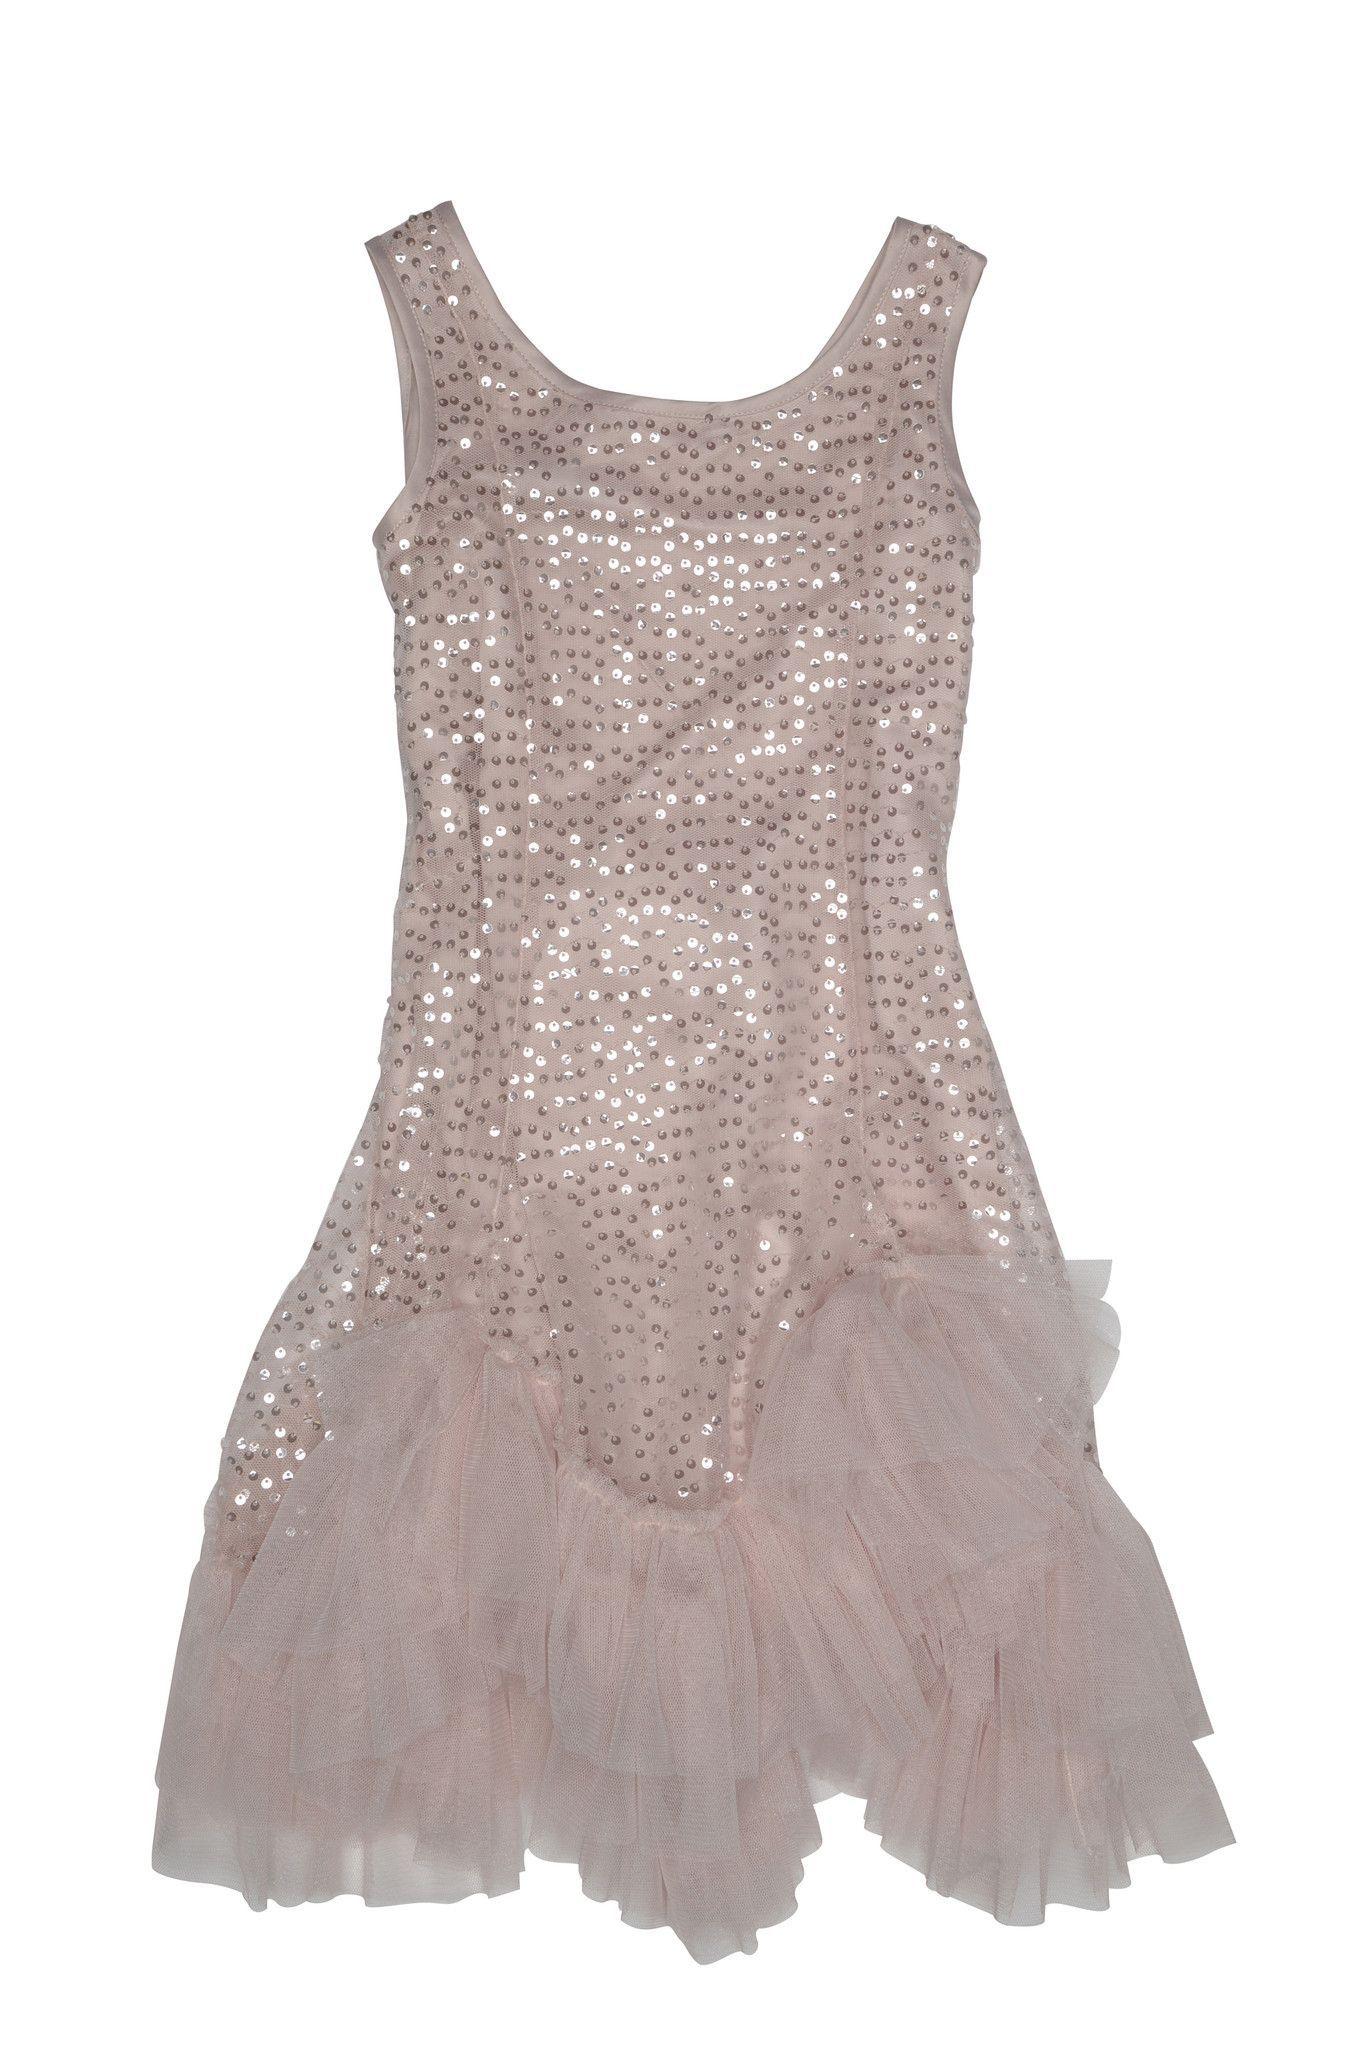 Biscotti Glitz & Glam Dress